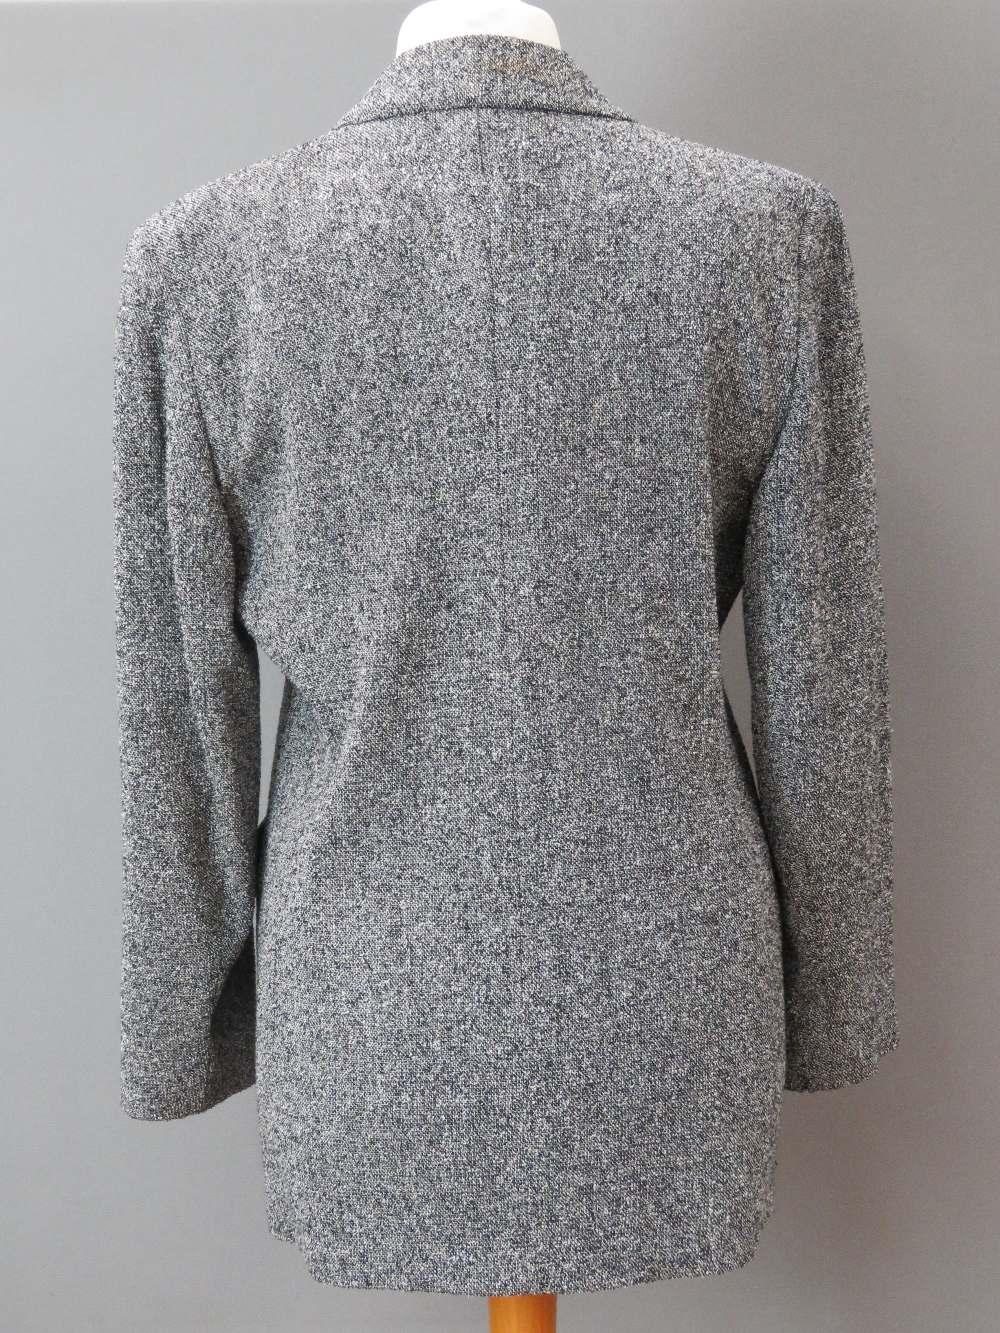 A ladies 40% wool jacket by Windsmoor. A - Image 2 of 4